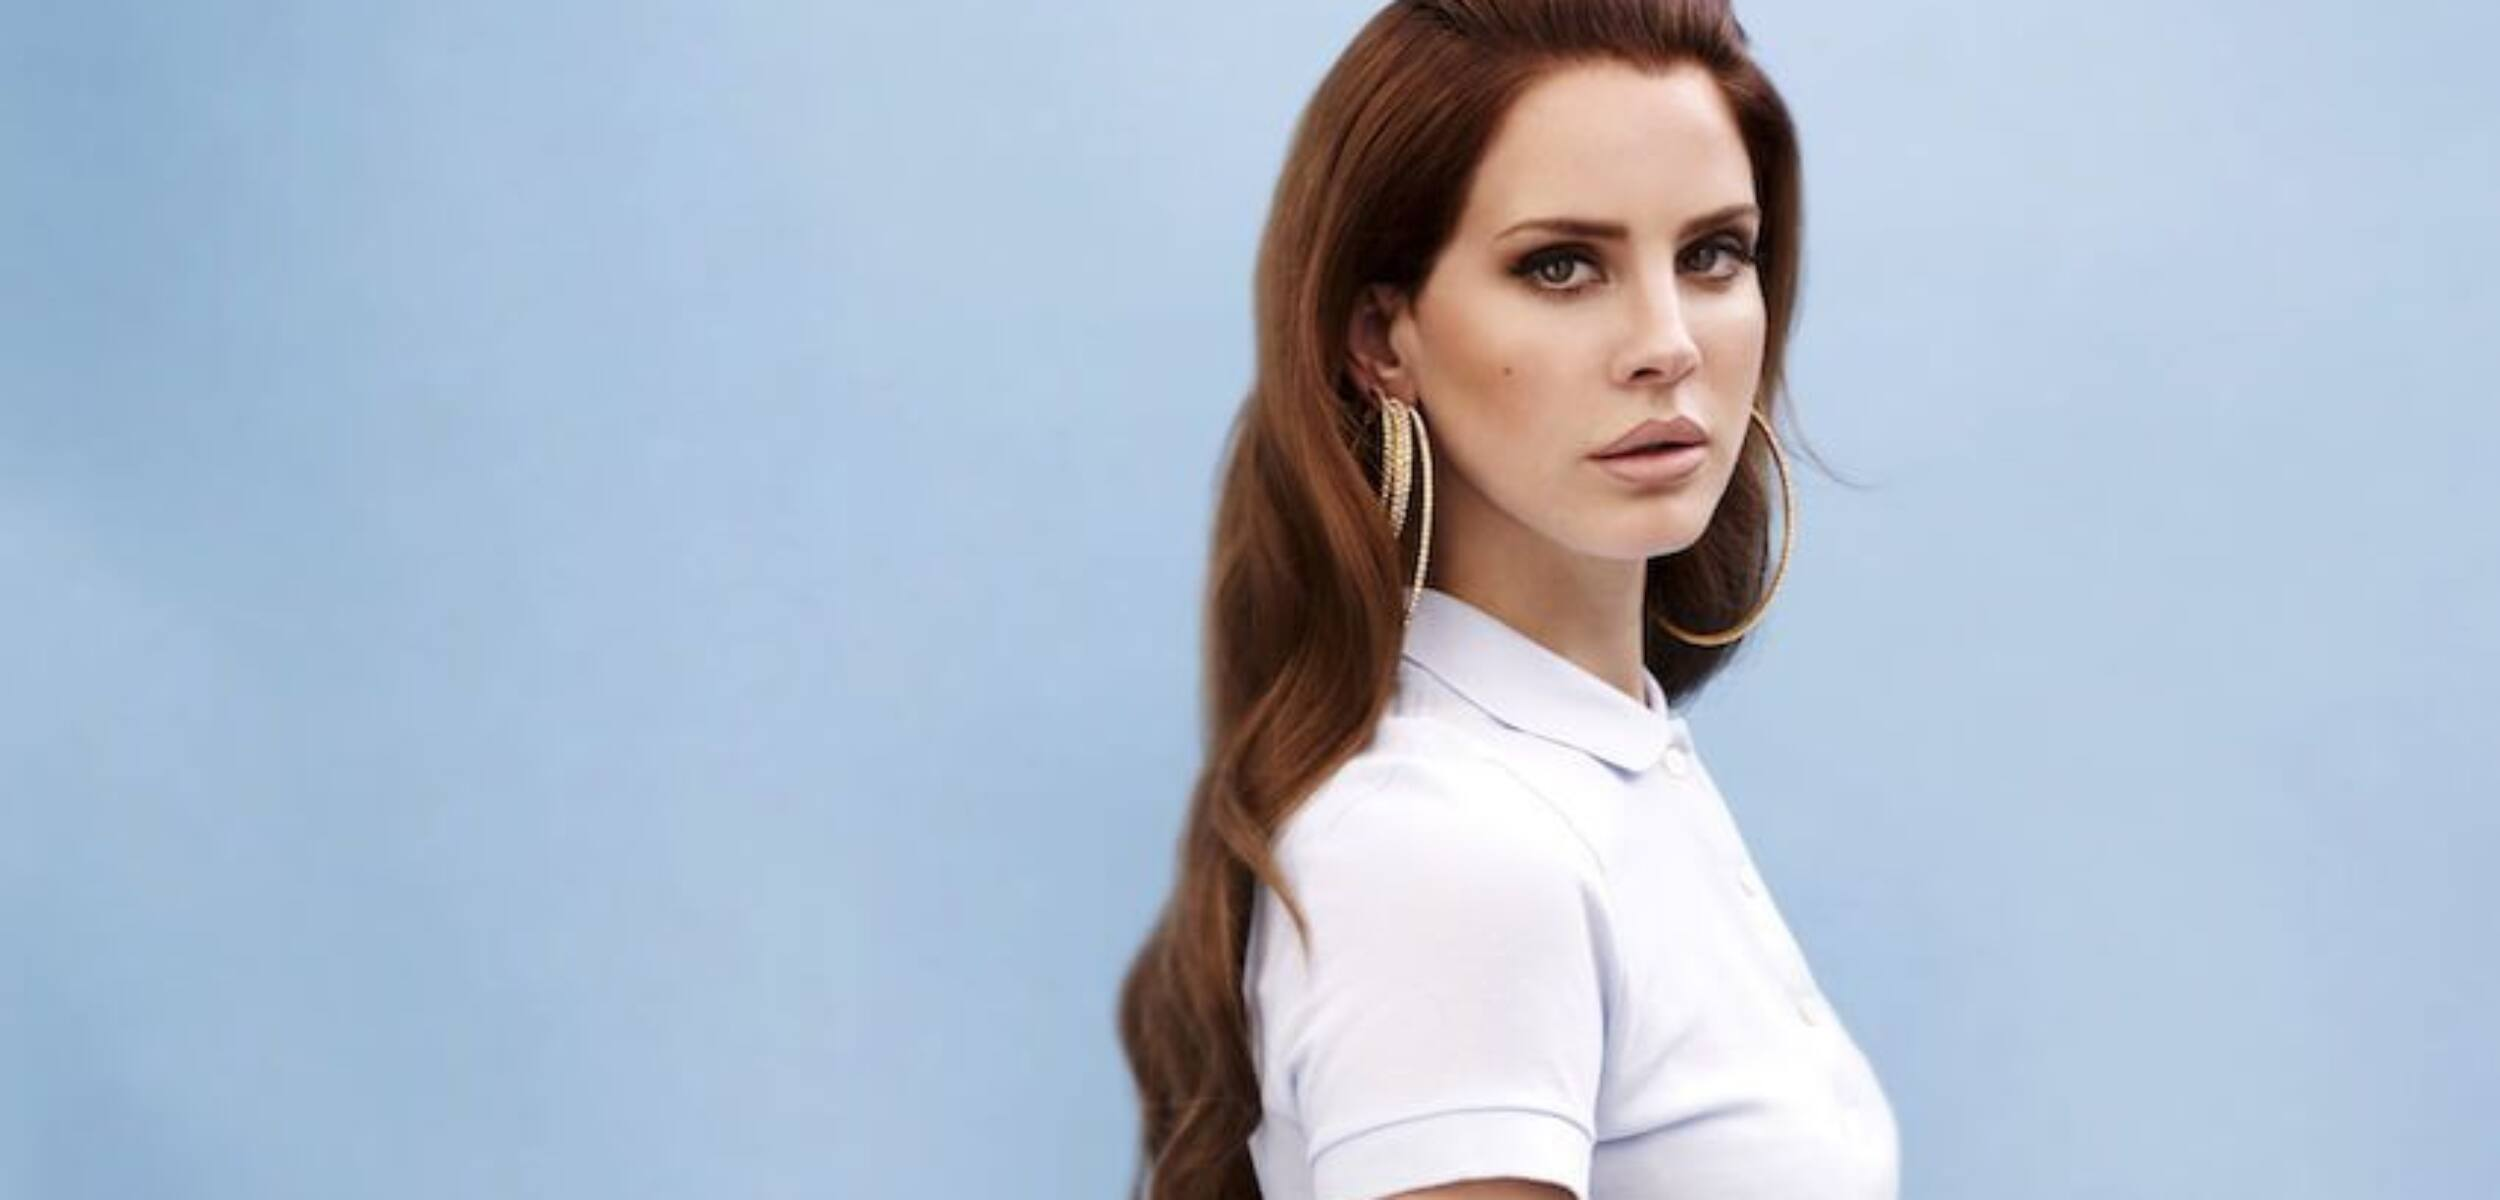 Lana del Rey en música 8D